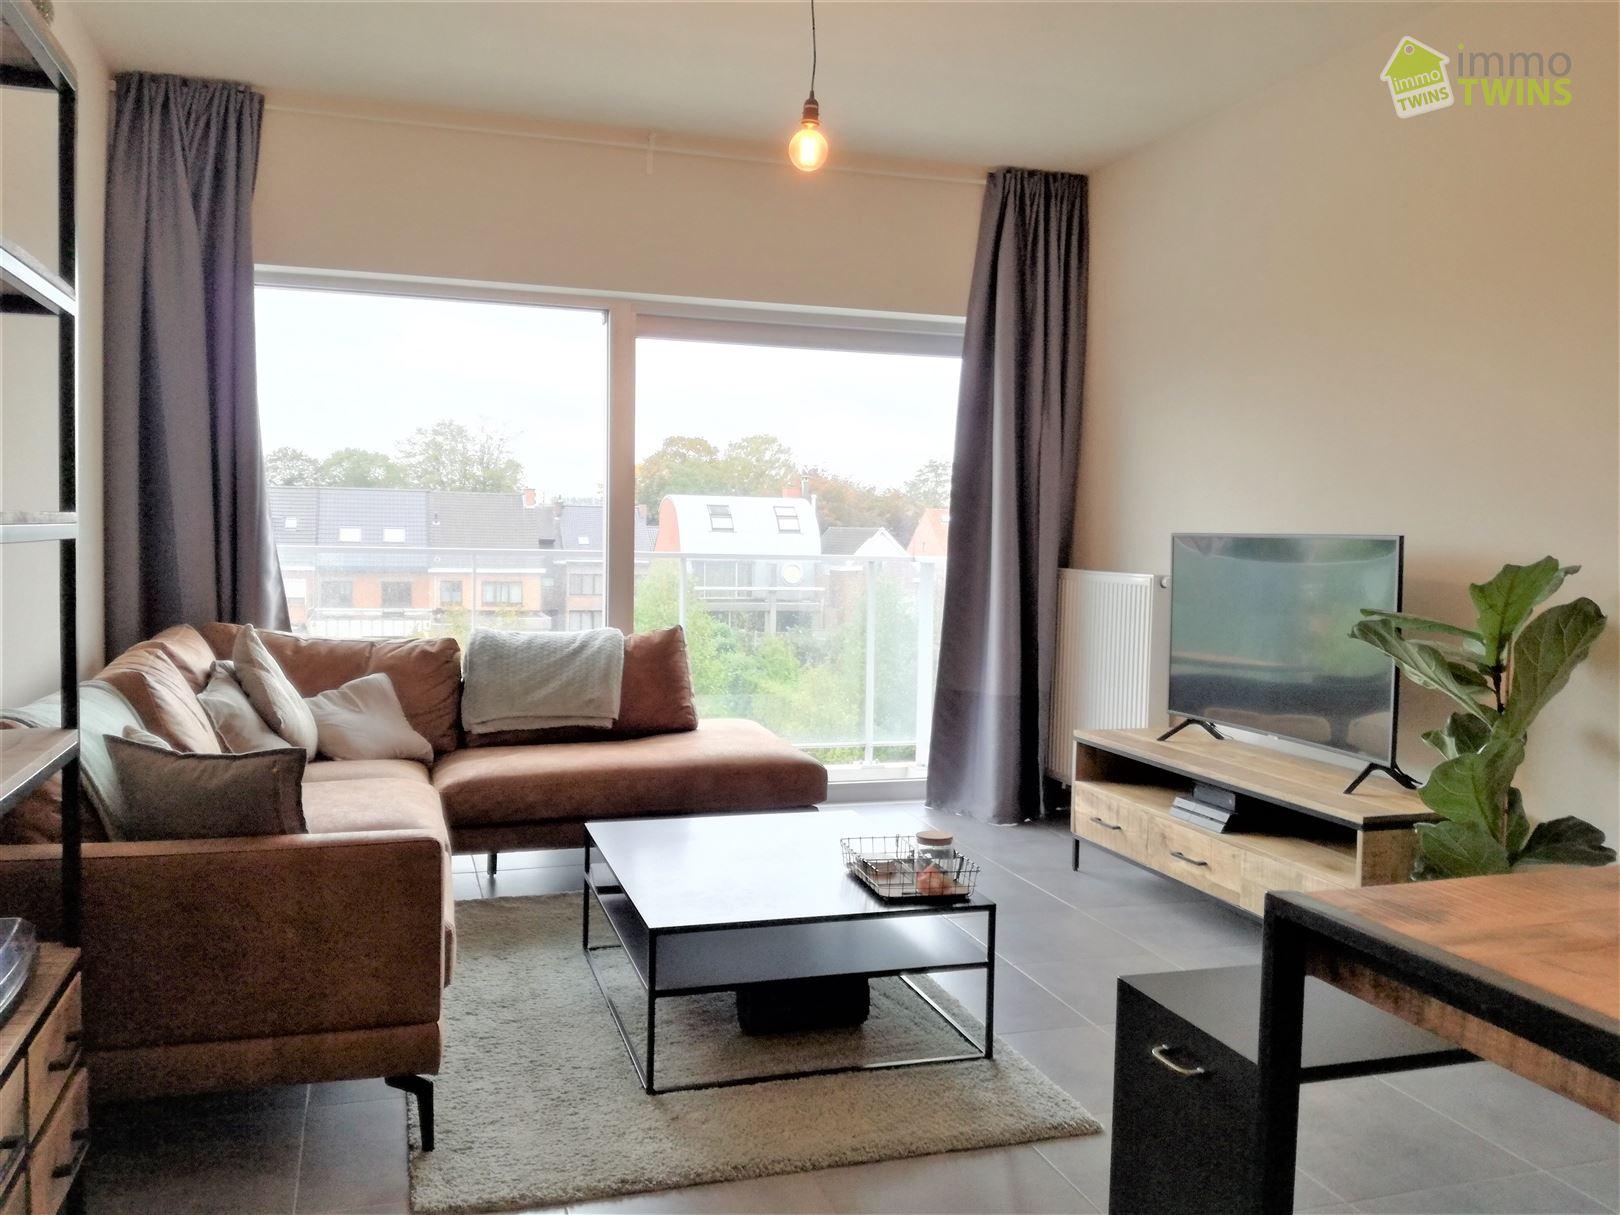 Foto 7 : Appartement te 9160 LOKEREN (België) - Prijs € 750